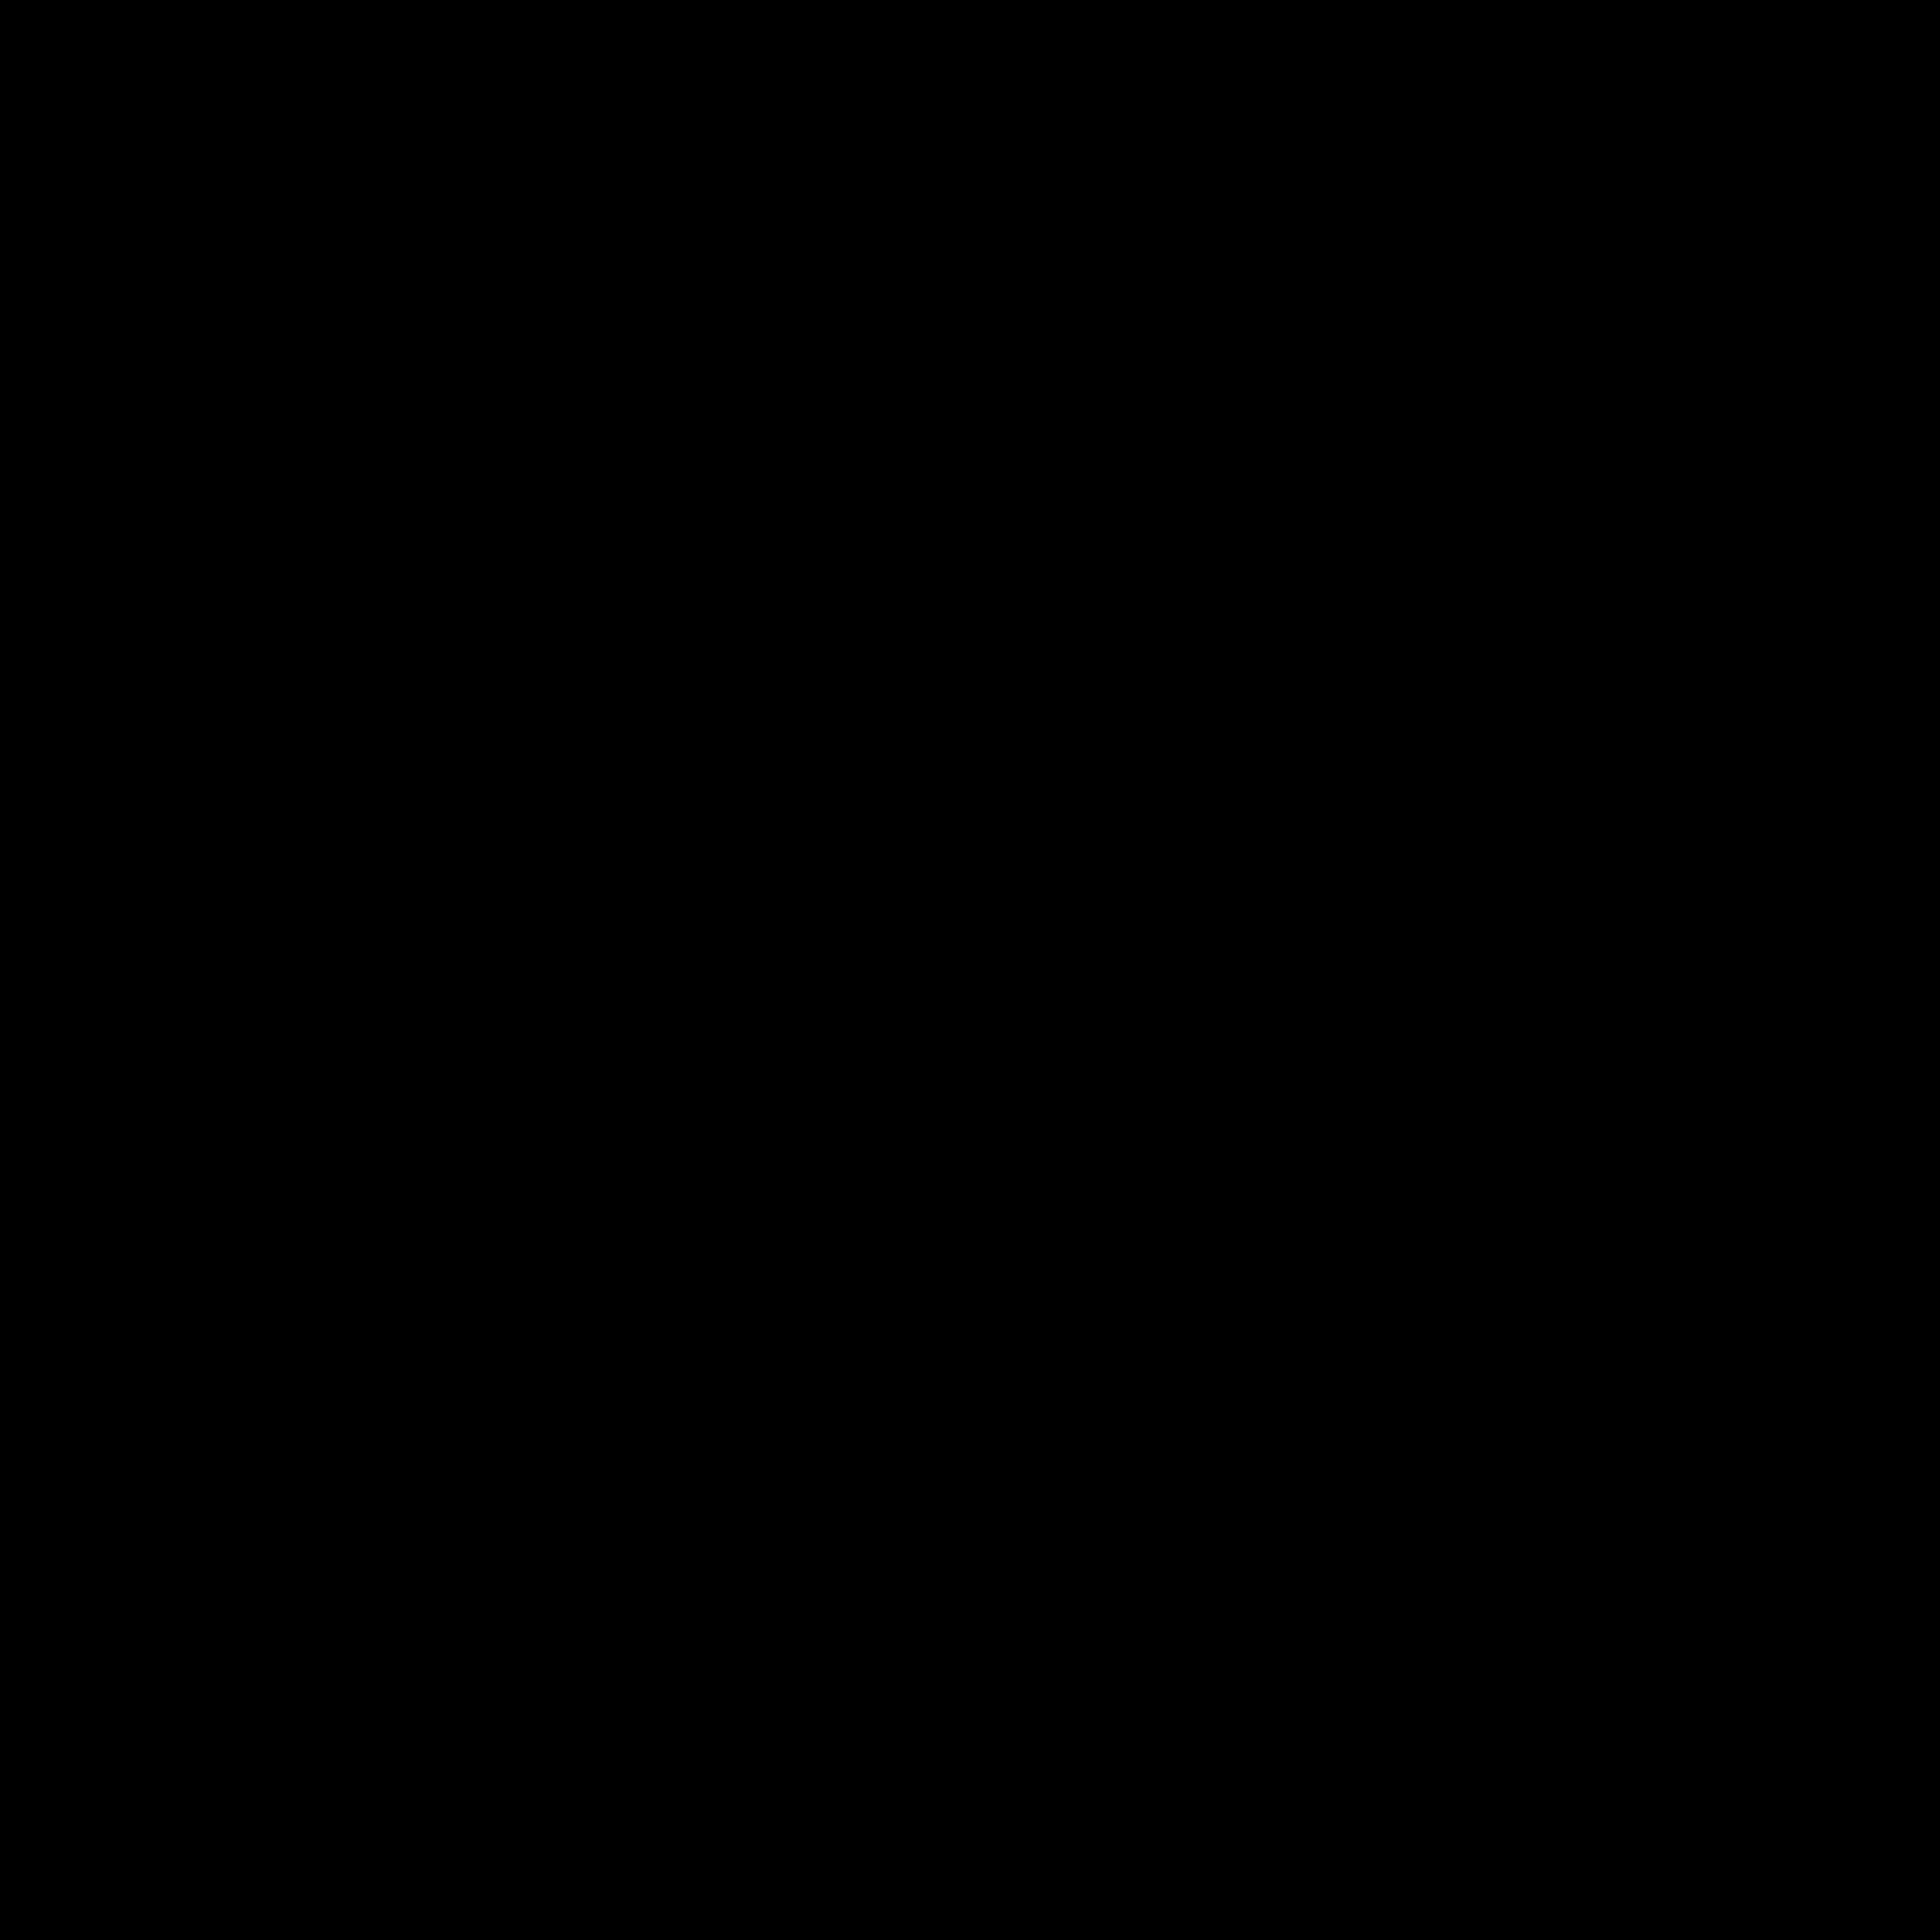 File golf olympic pictogram. Golfer clipart svg